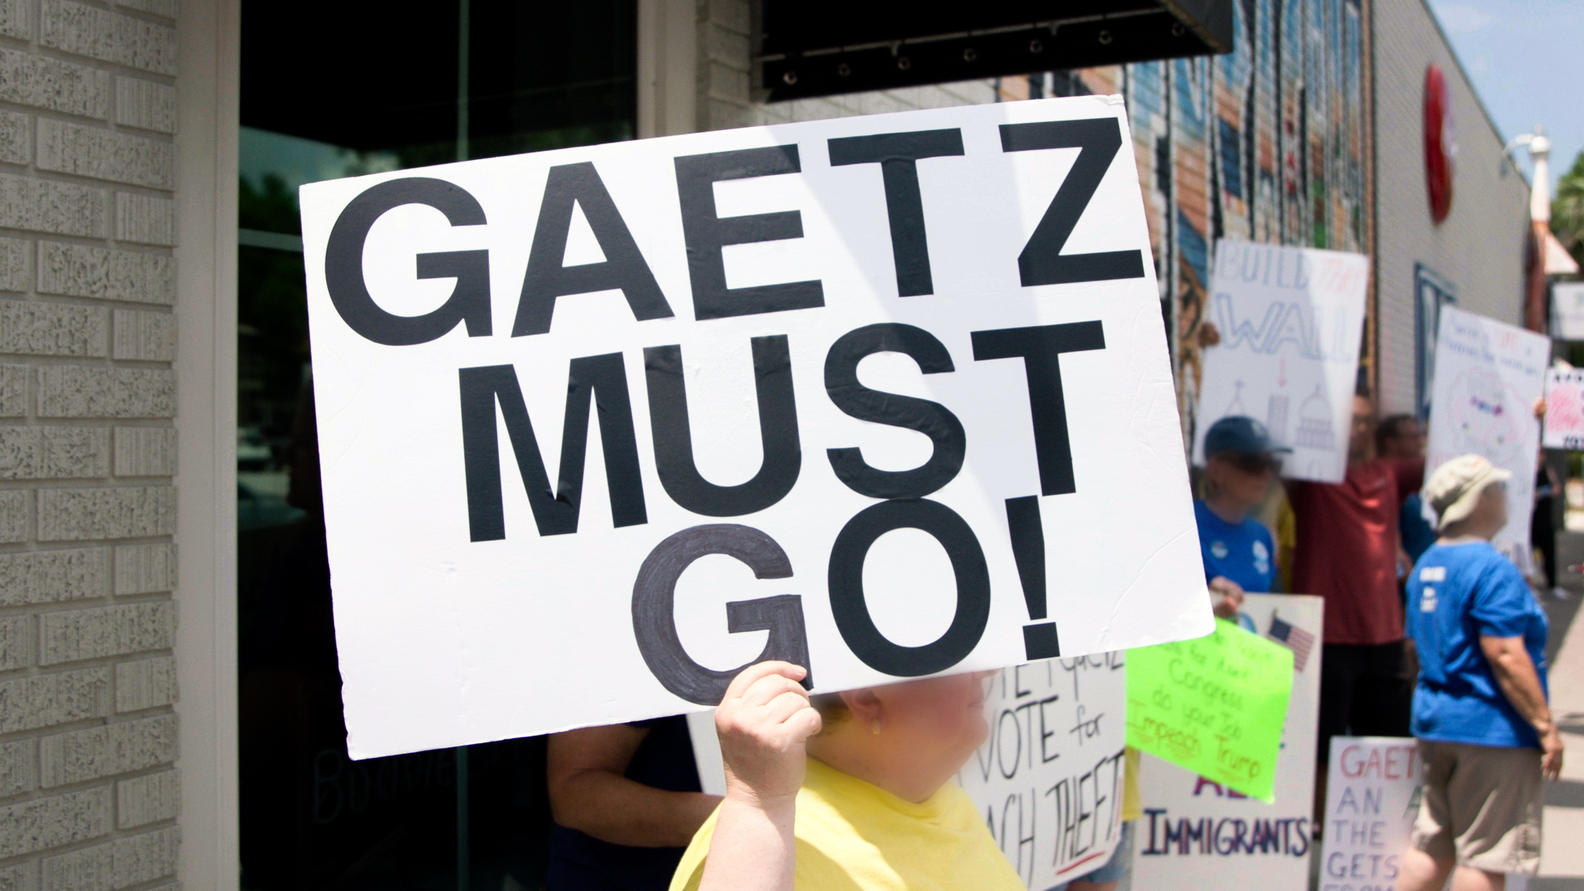 Matt Gaetz (R-FL) protest signs in his district in Florida